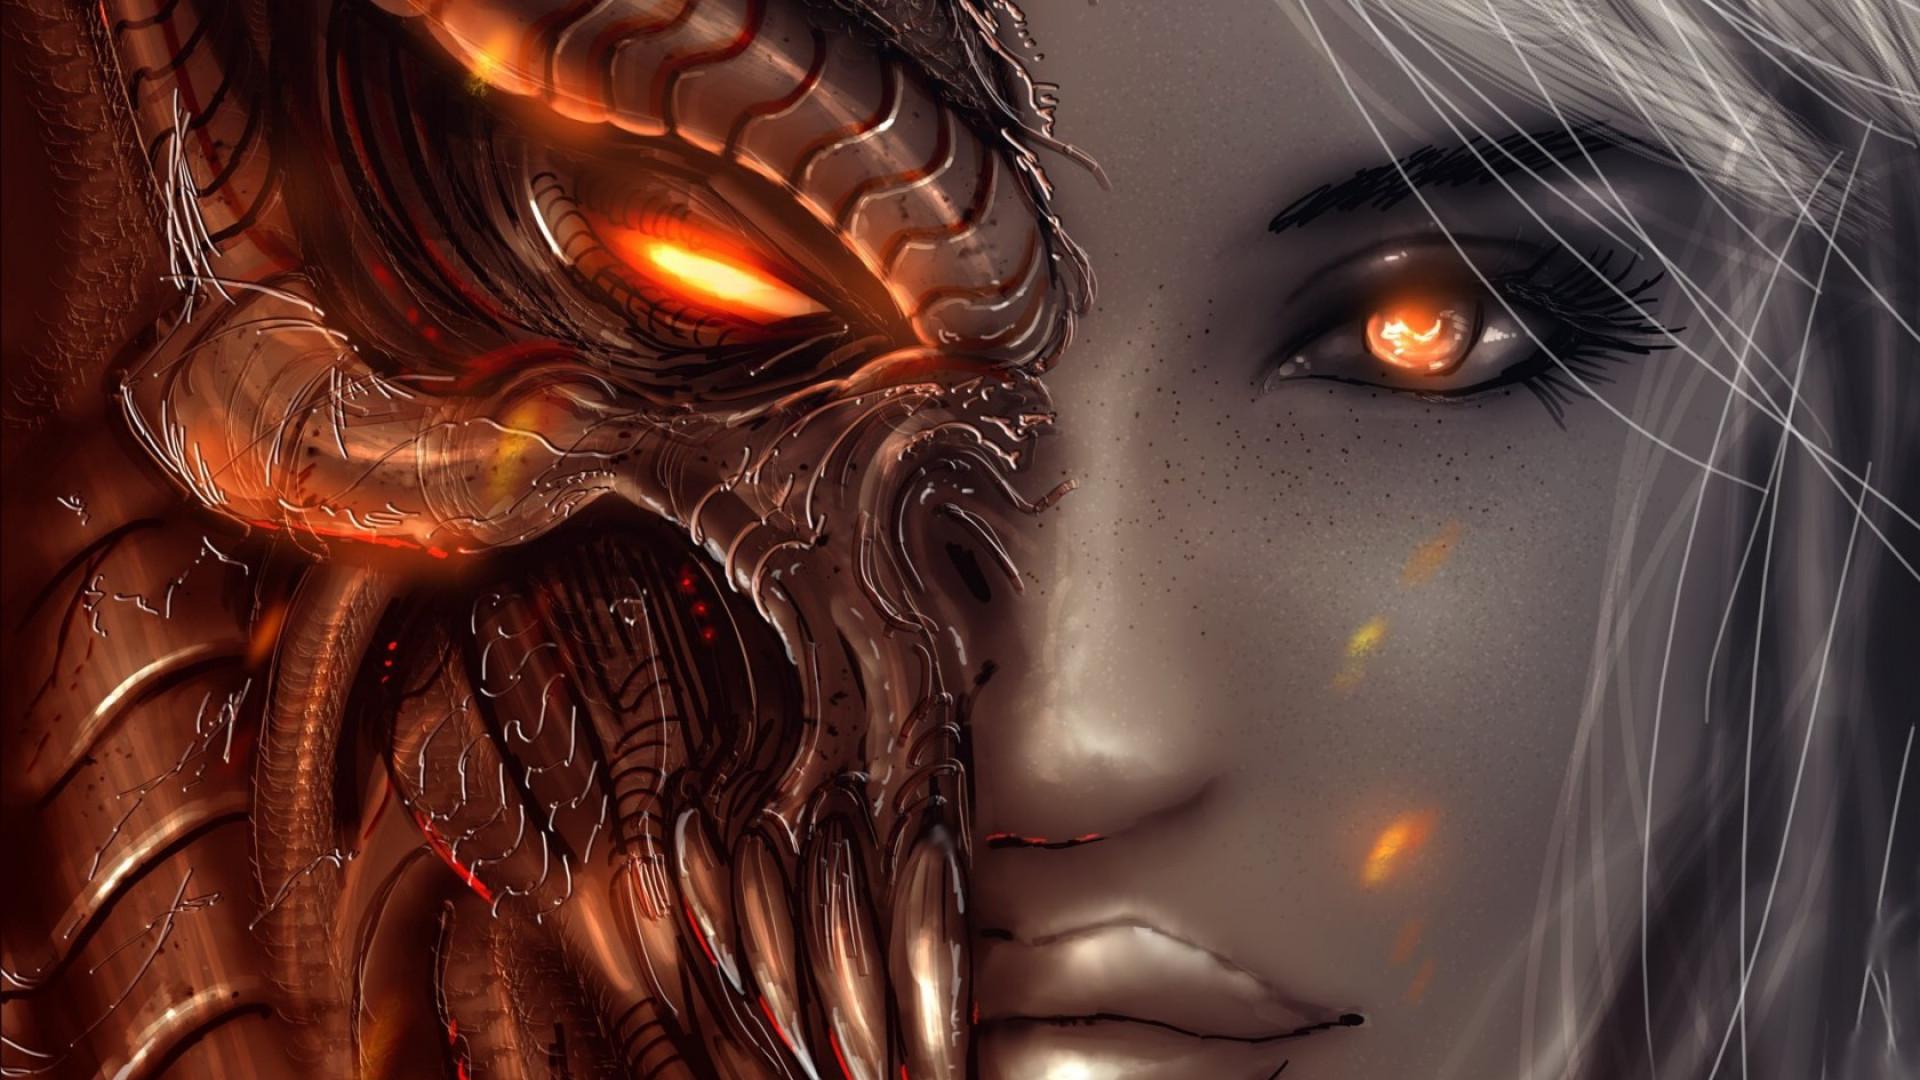 HD Diablo 3 Wallpaper 77 Pictures